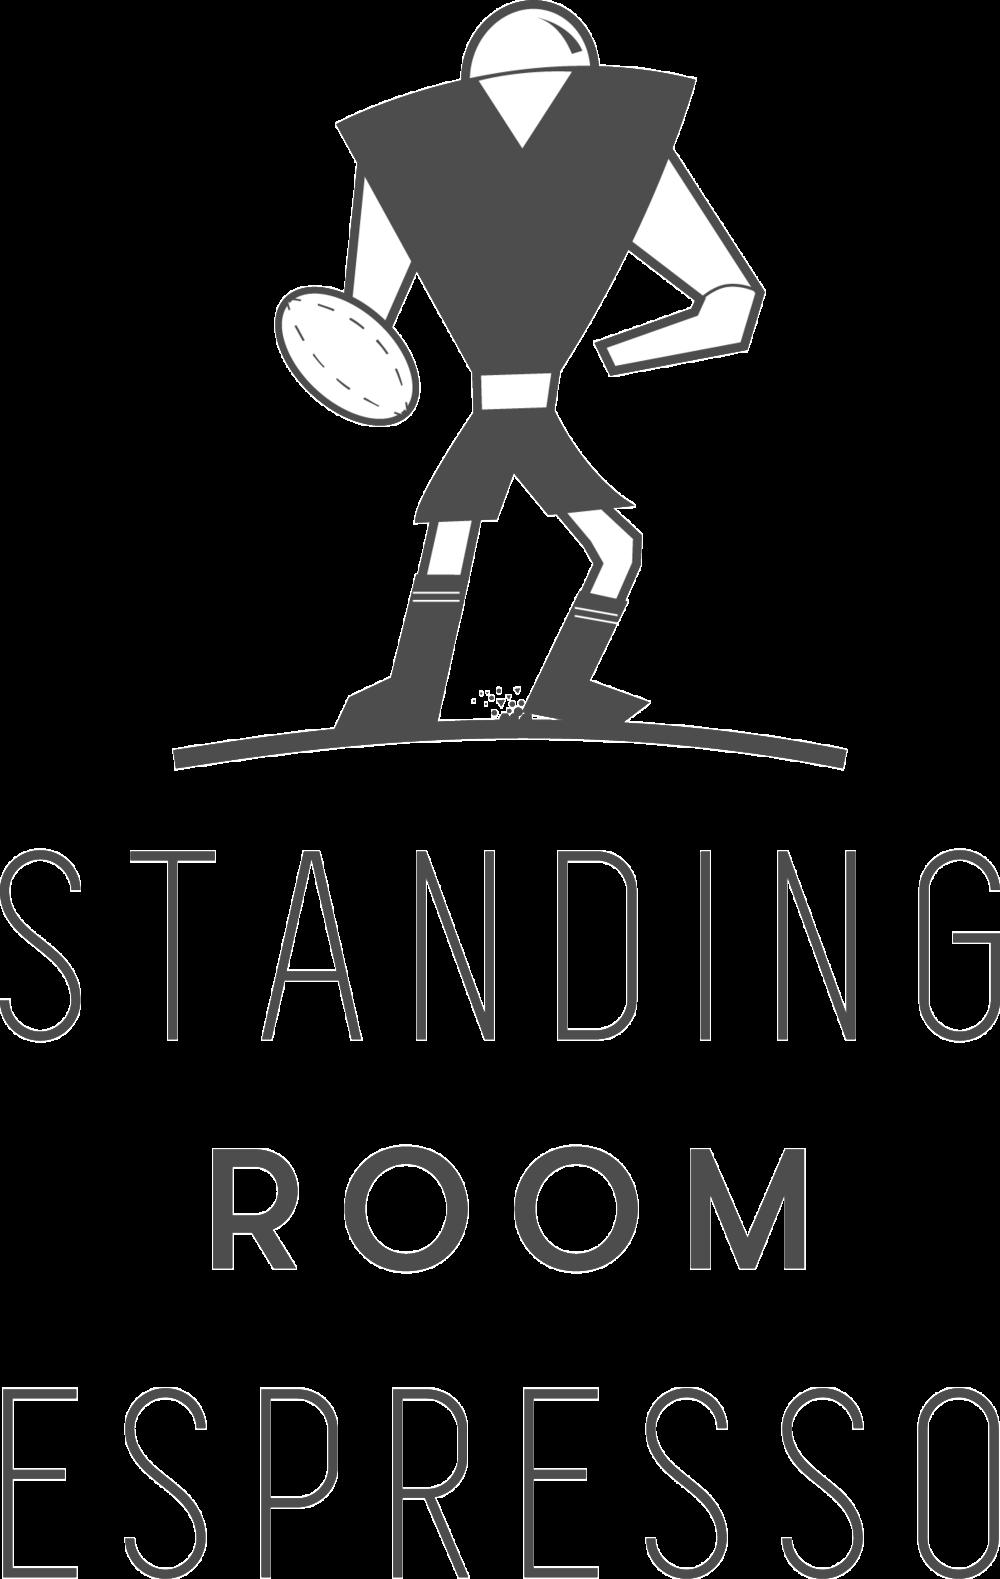 Standing Room Espresso